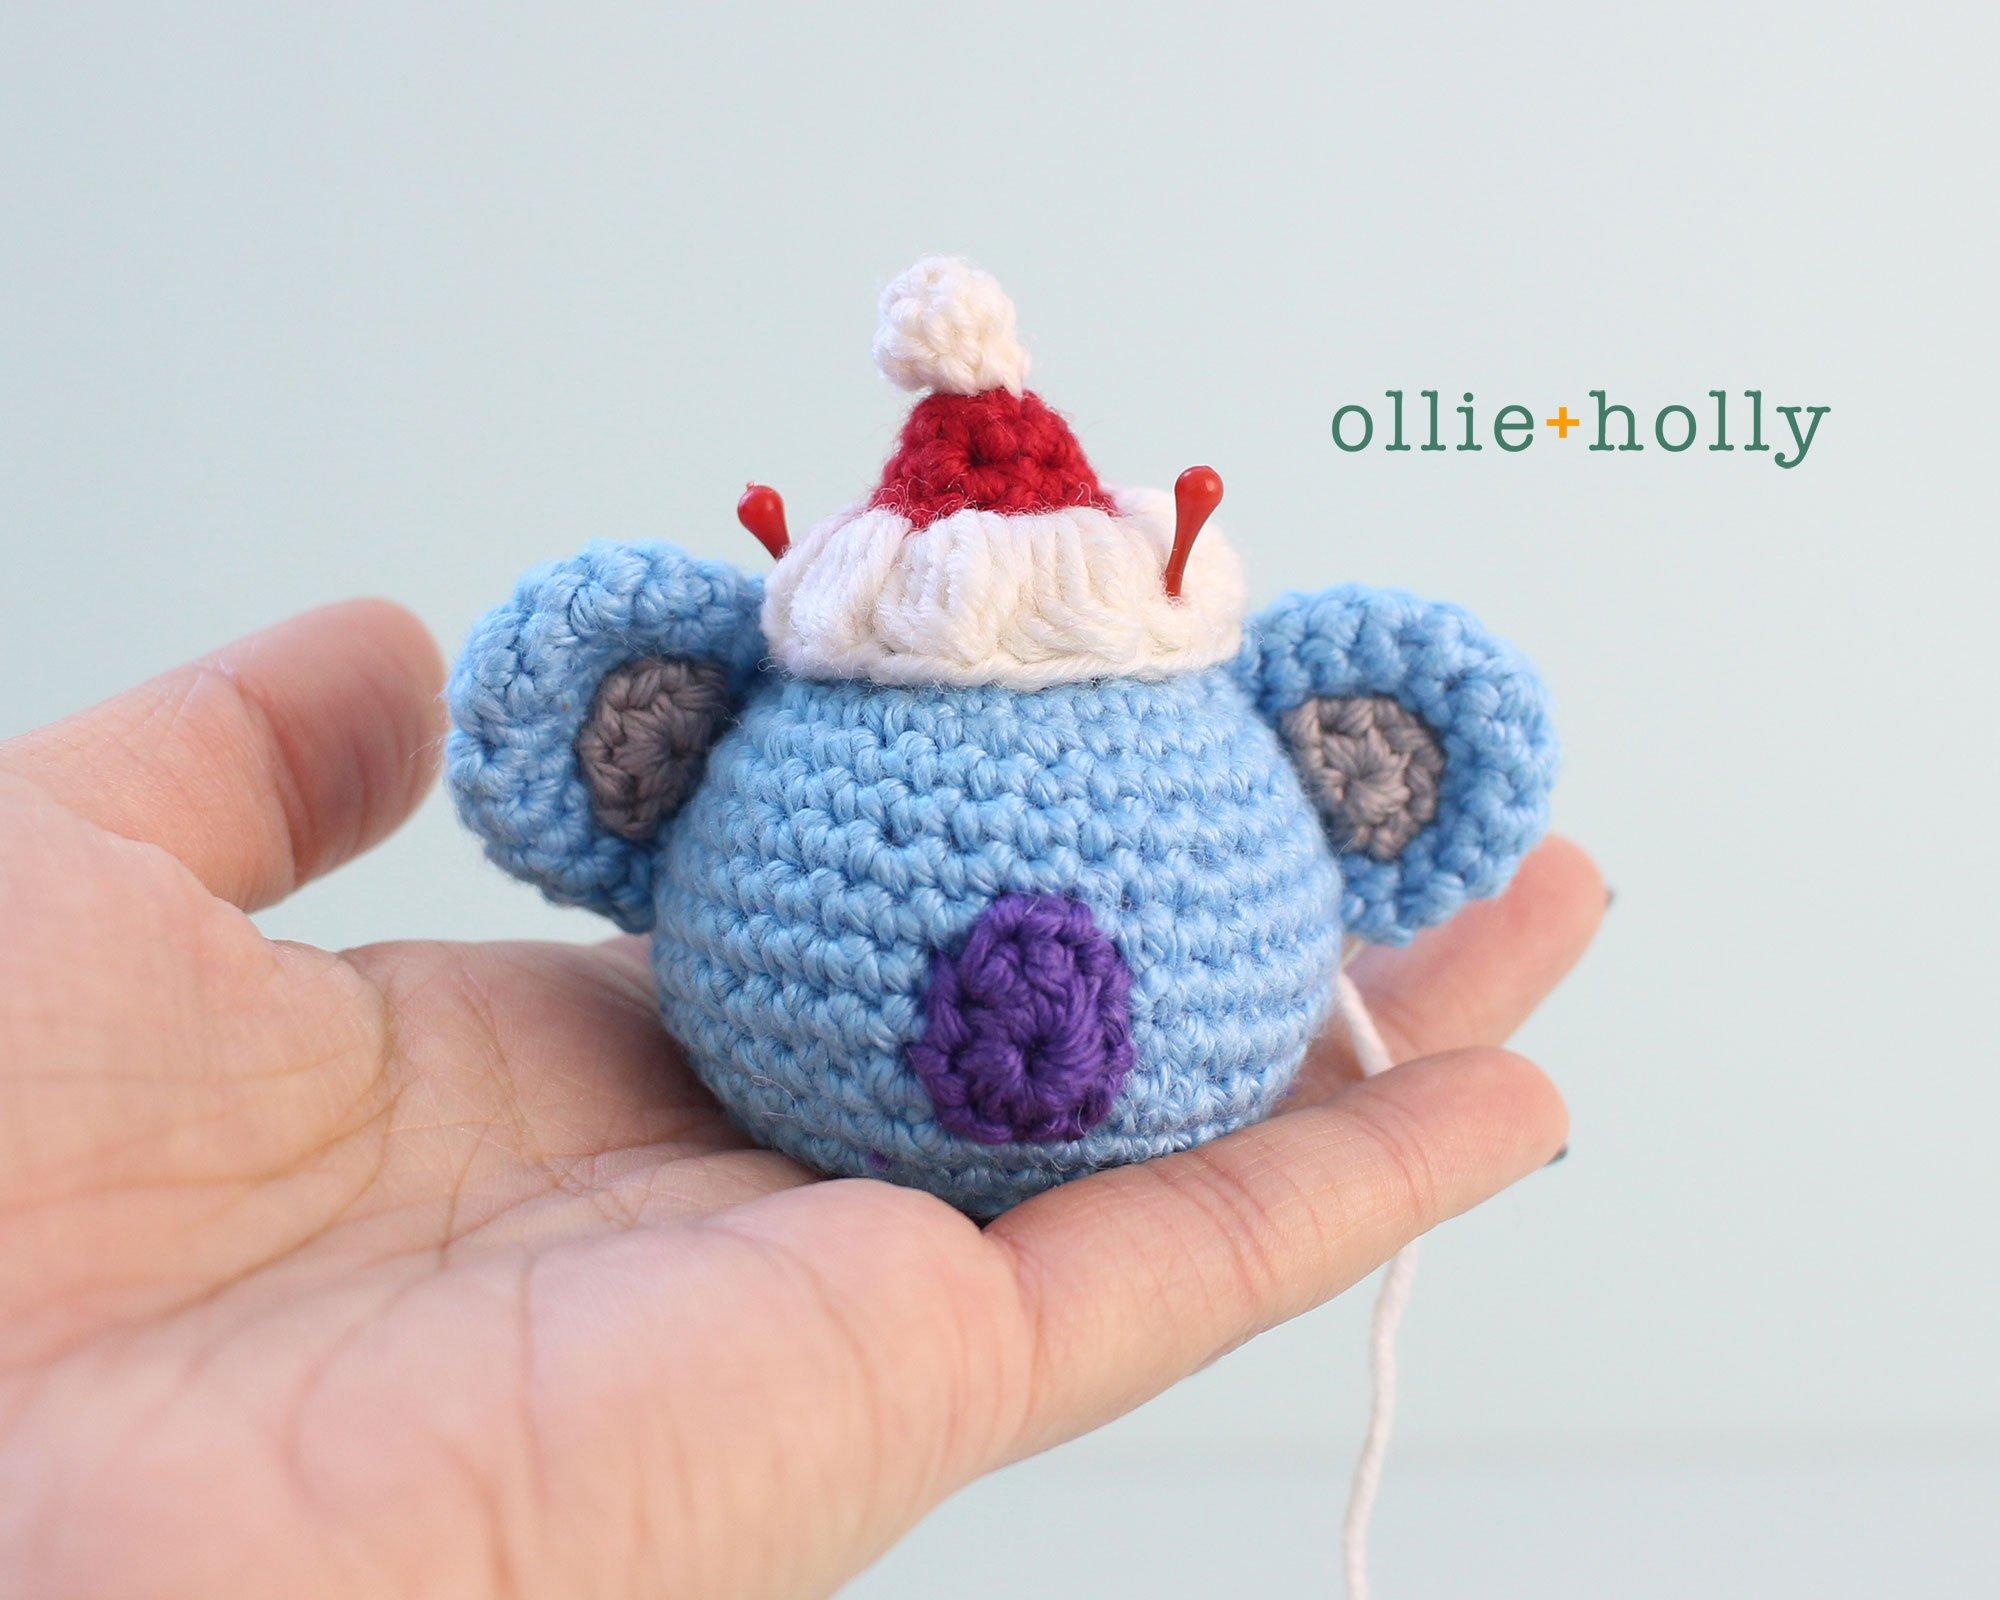 Free BT21 Koya Christmas Ornament Amigurumi Crochet Pattern Step 11